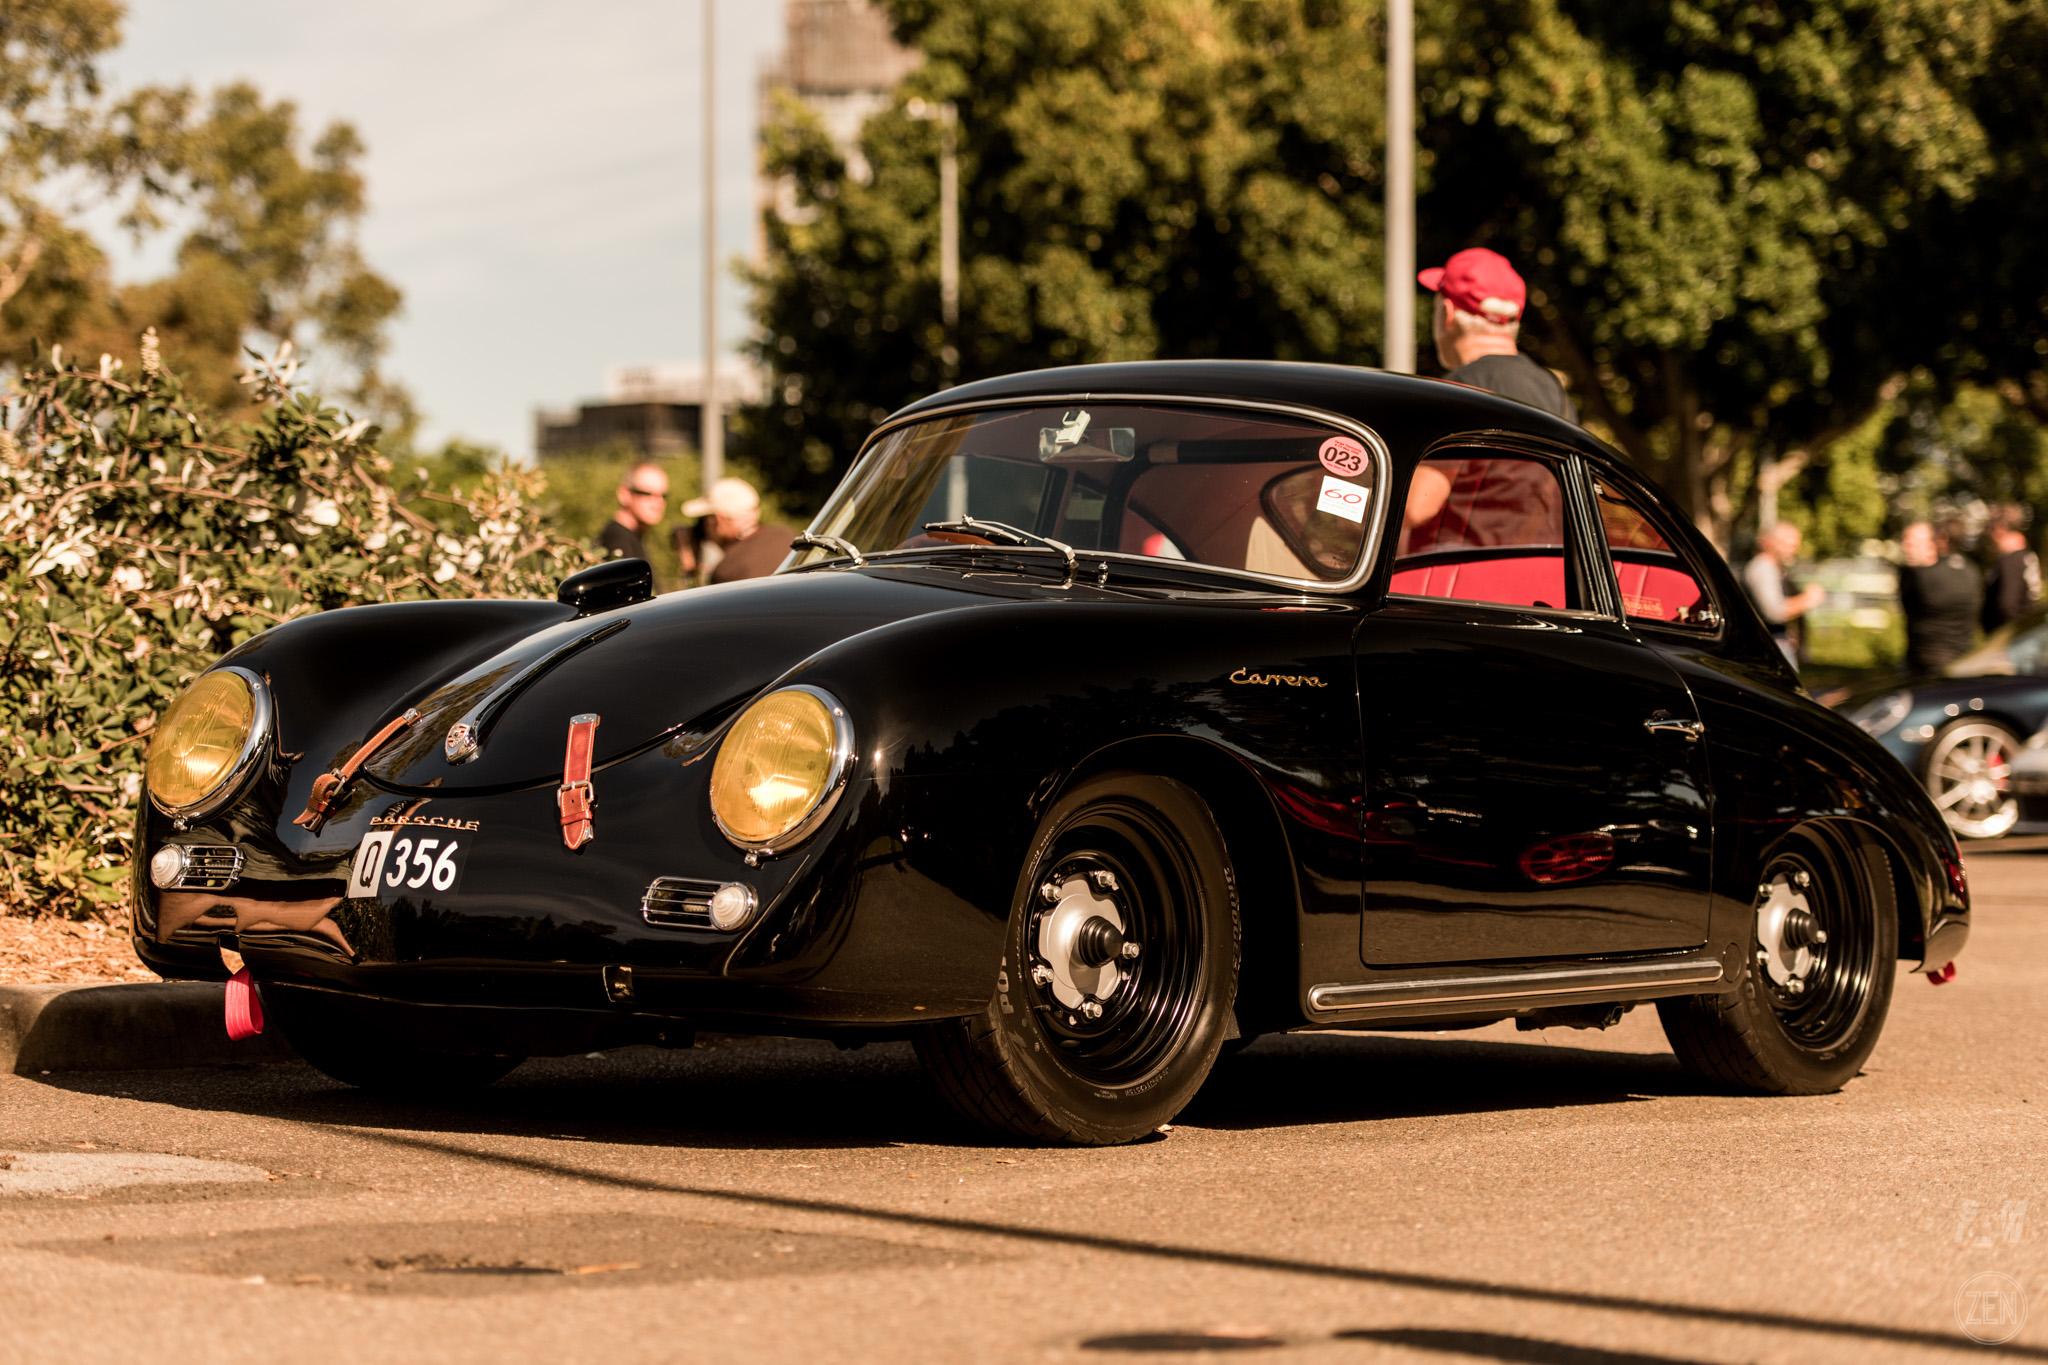 2019-10-27 - Autohaus Porsches & Coffee 171